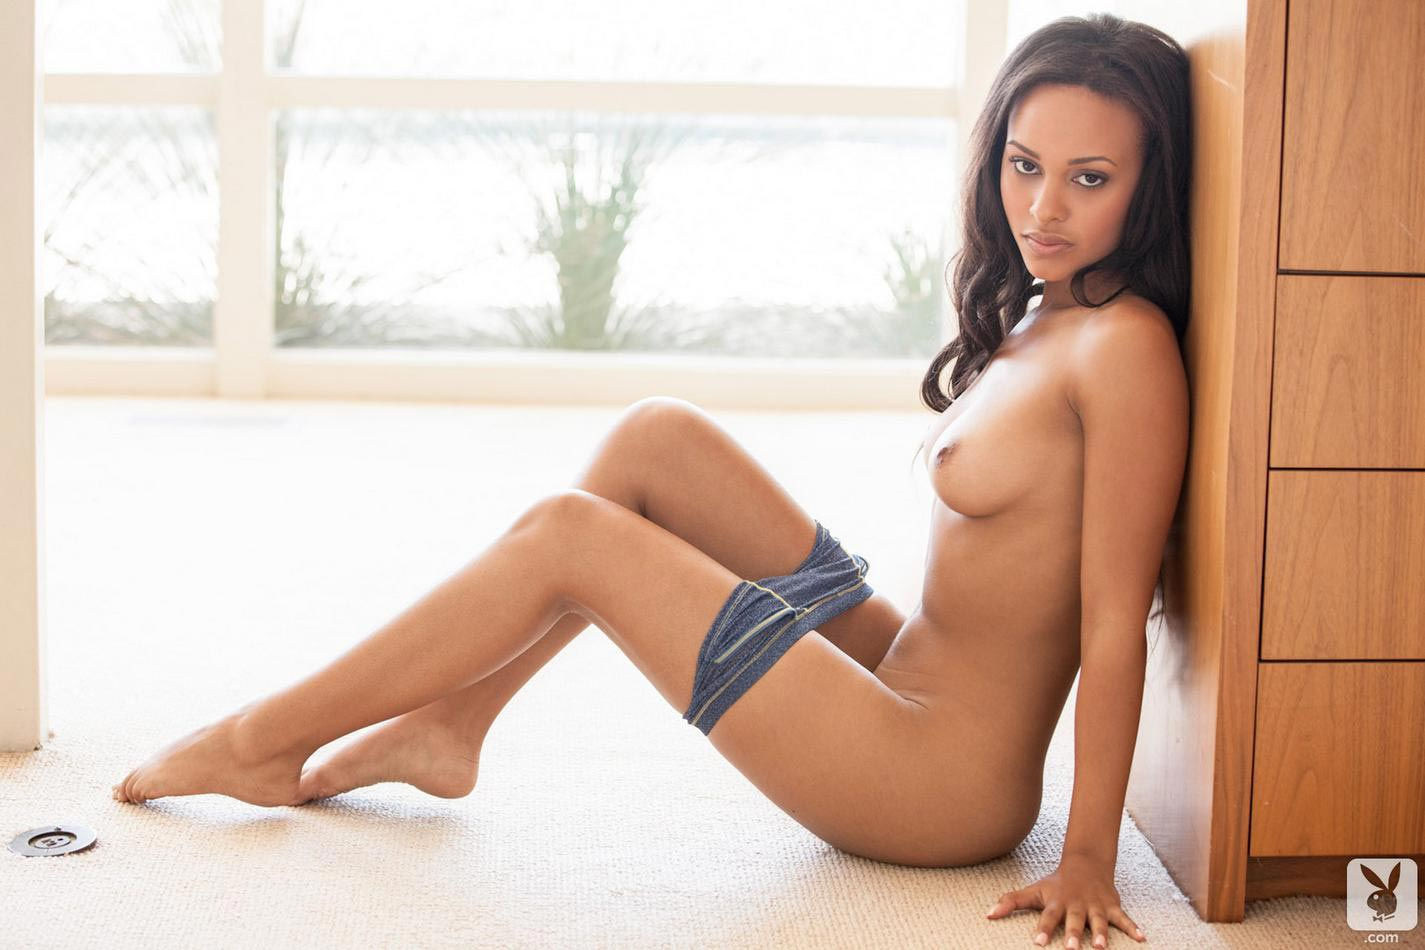 Playboy Kaylia playmate cassandra